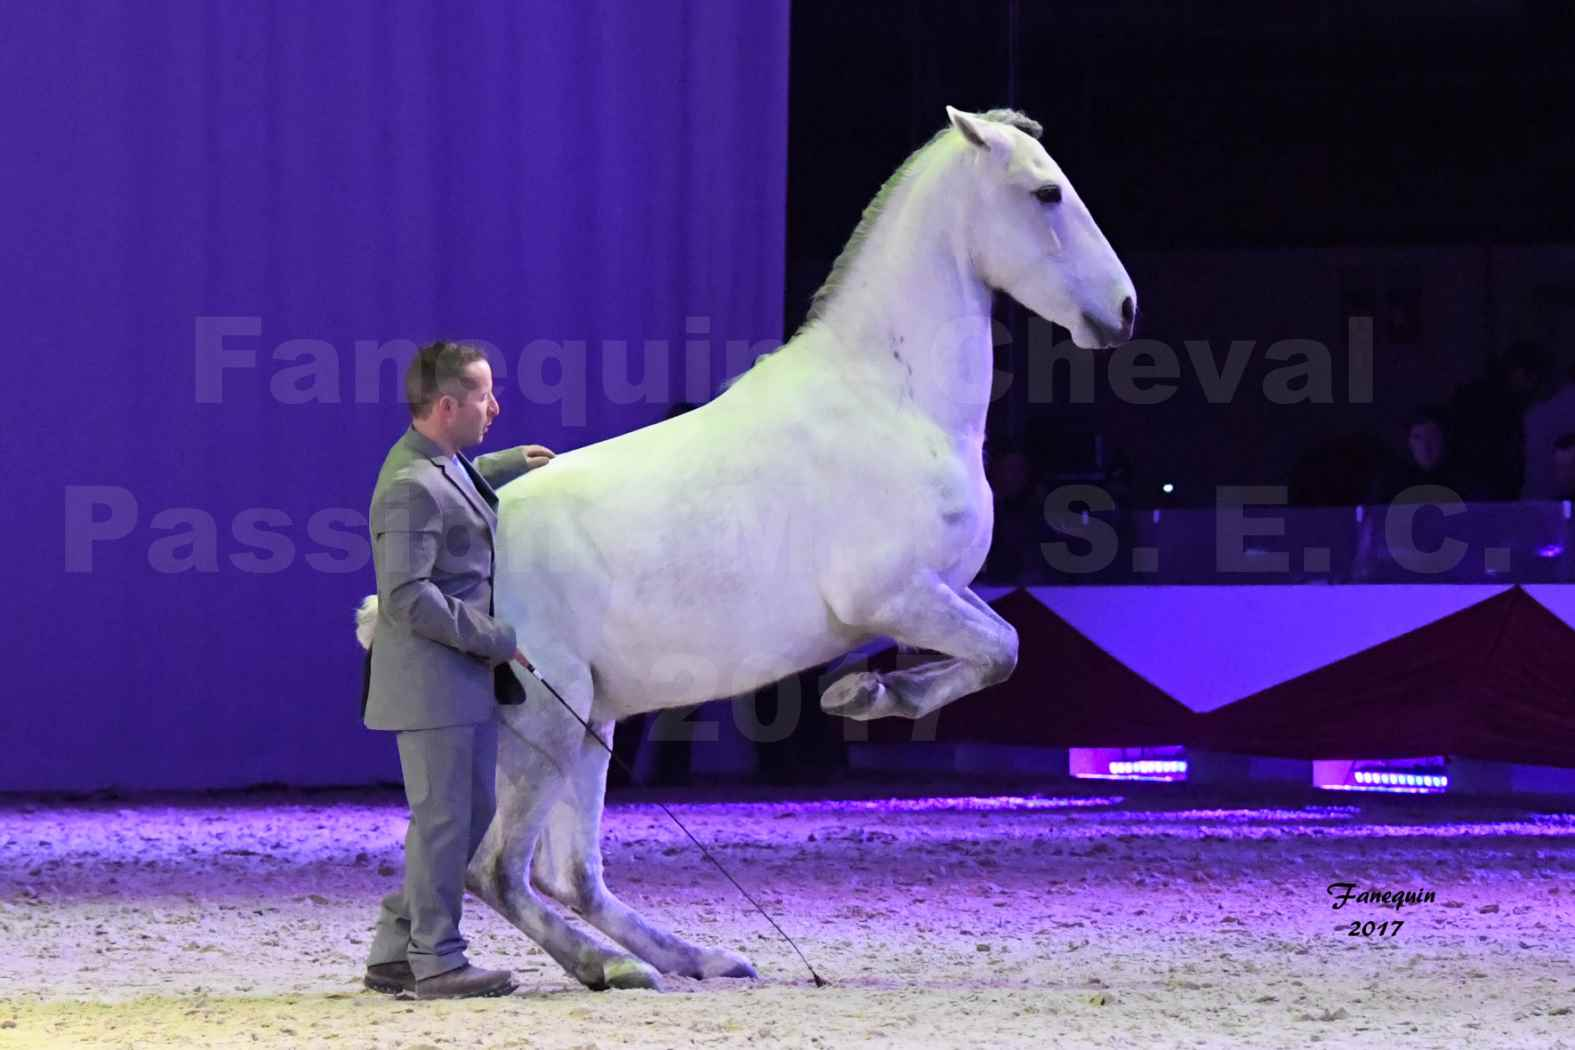 Cheval Passion 2017 - M. I. S. E. C. - Ludovic LONGO & 1 cheval en liberté - 12